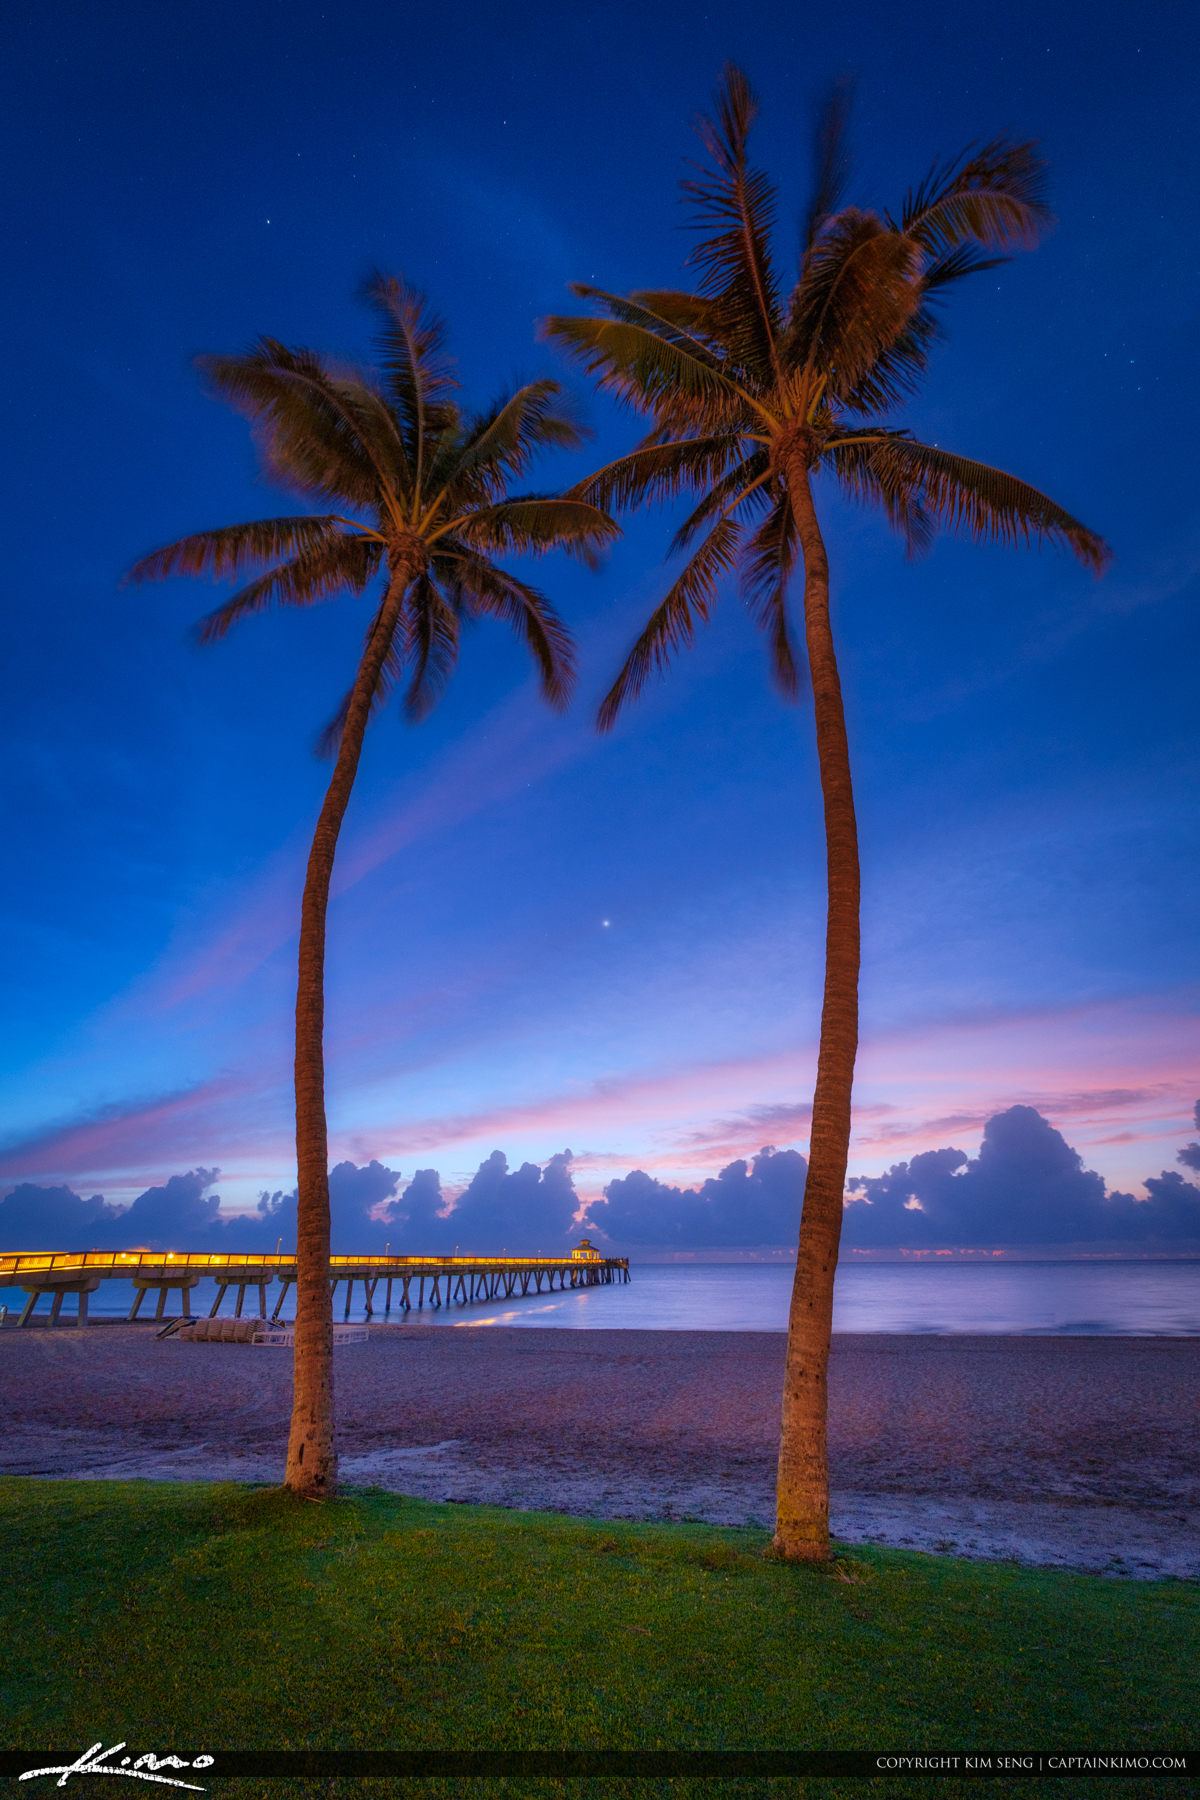 Early Morning at Deerfield Beach Fishing Pier Coconut Tree